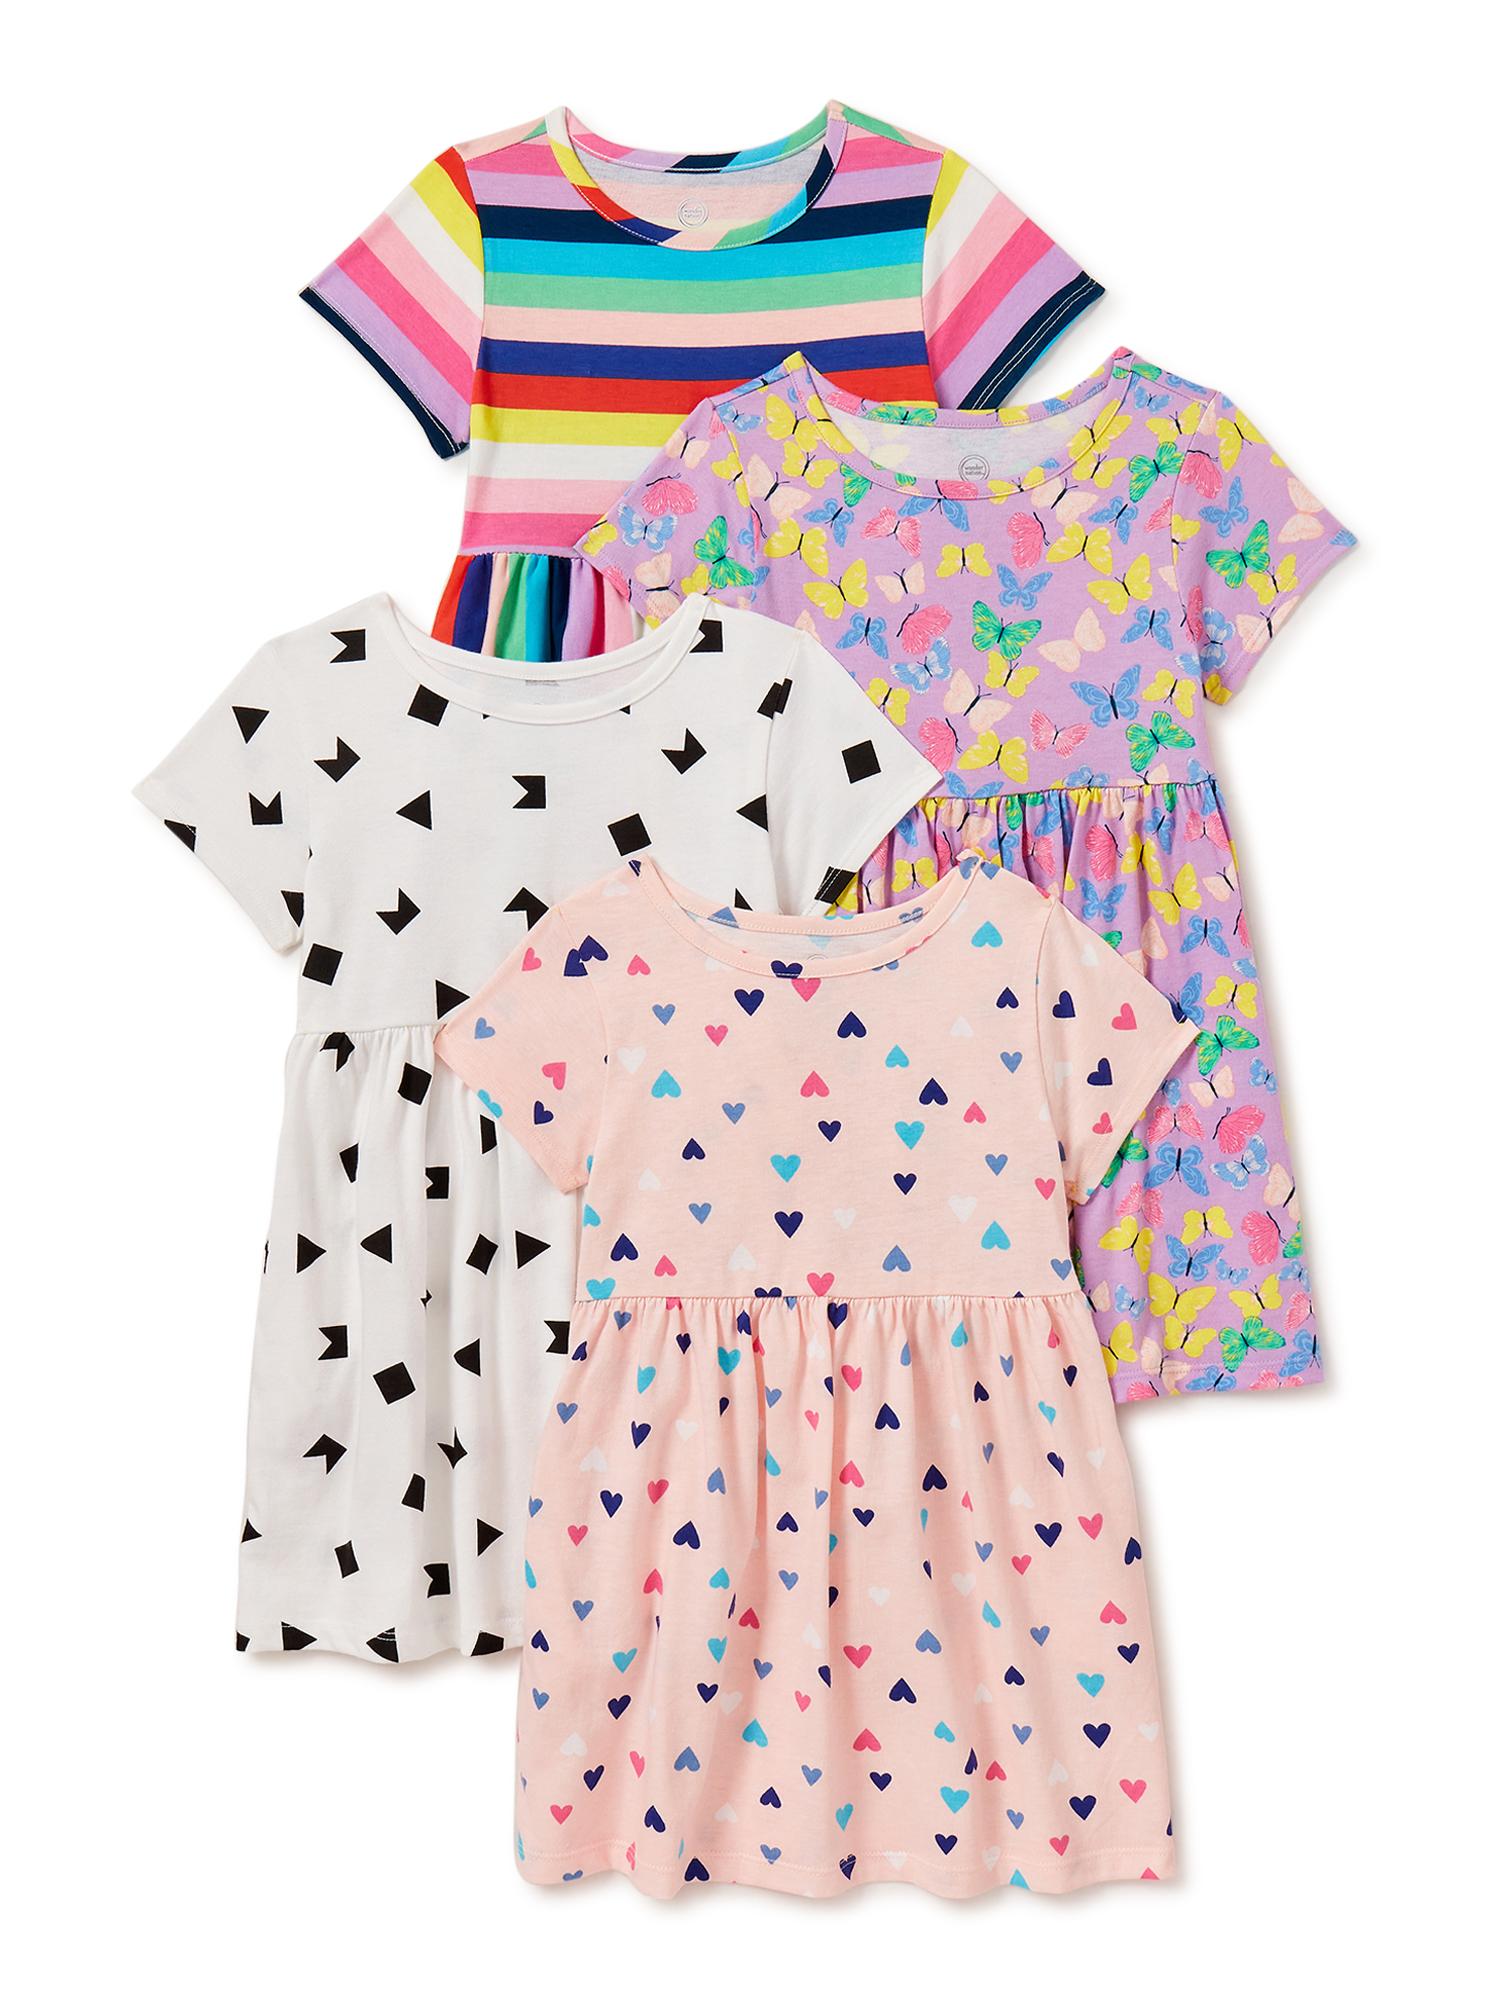 All Seasons Dress Toddler Girl/'s Dress Green Turtle Pinafore Dress Reversible A Line Dress Party dress Size 6 months